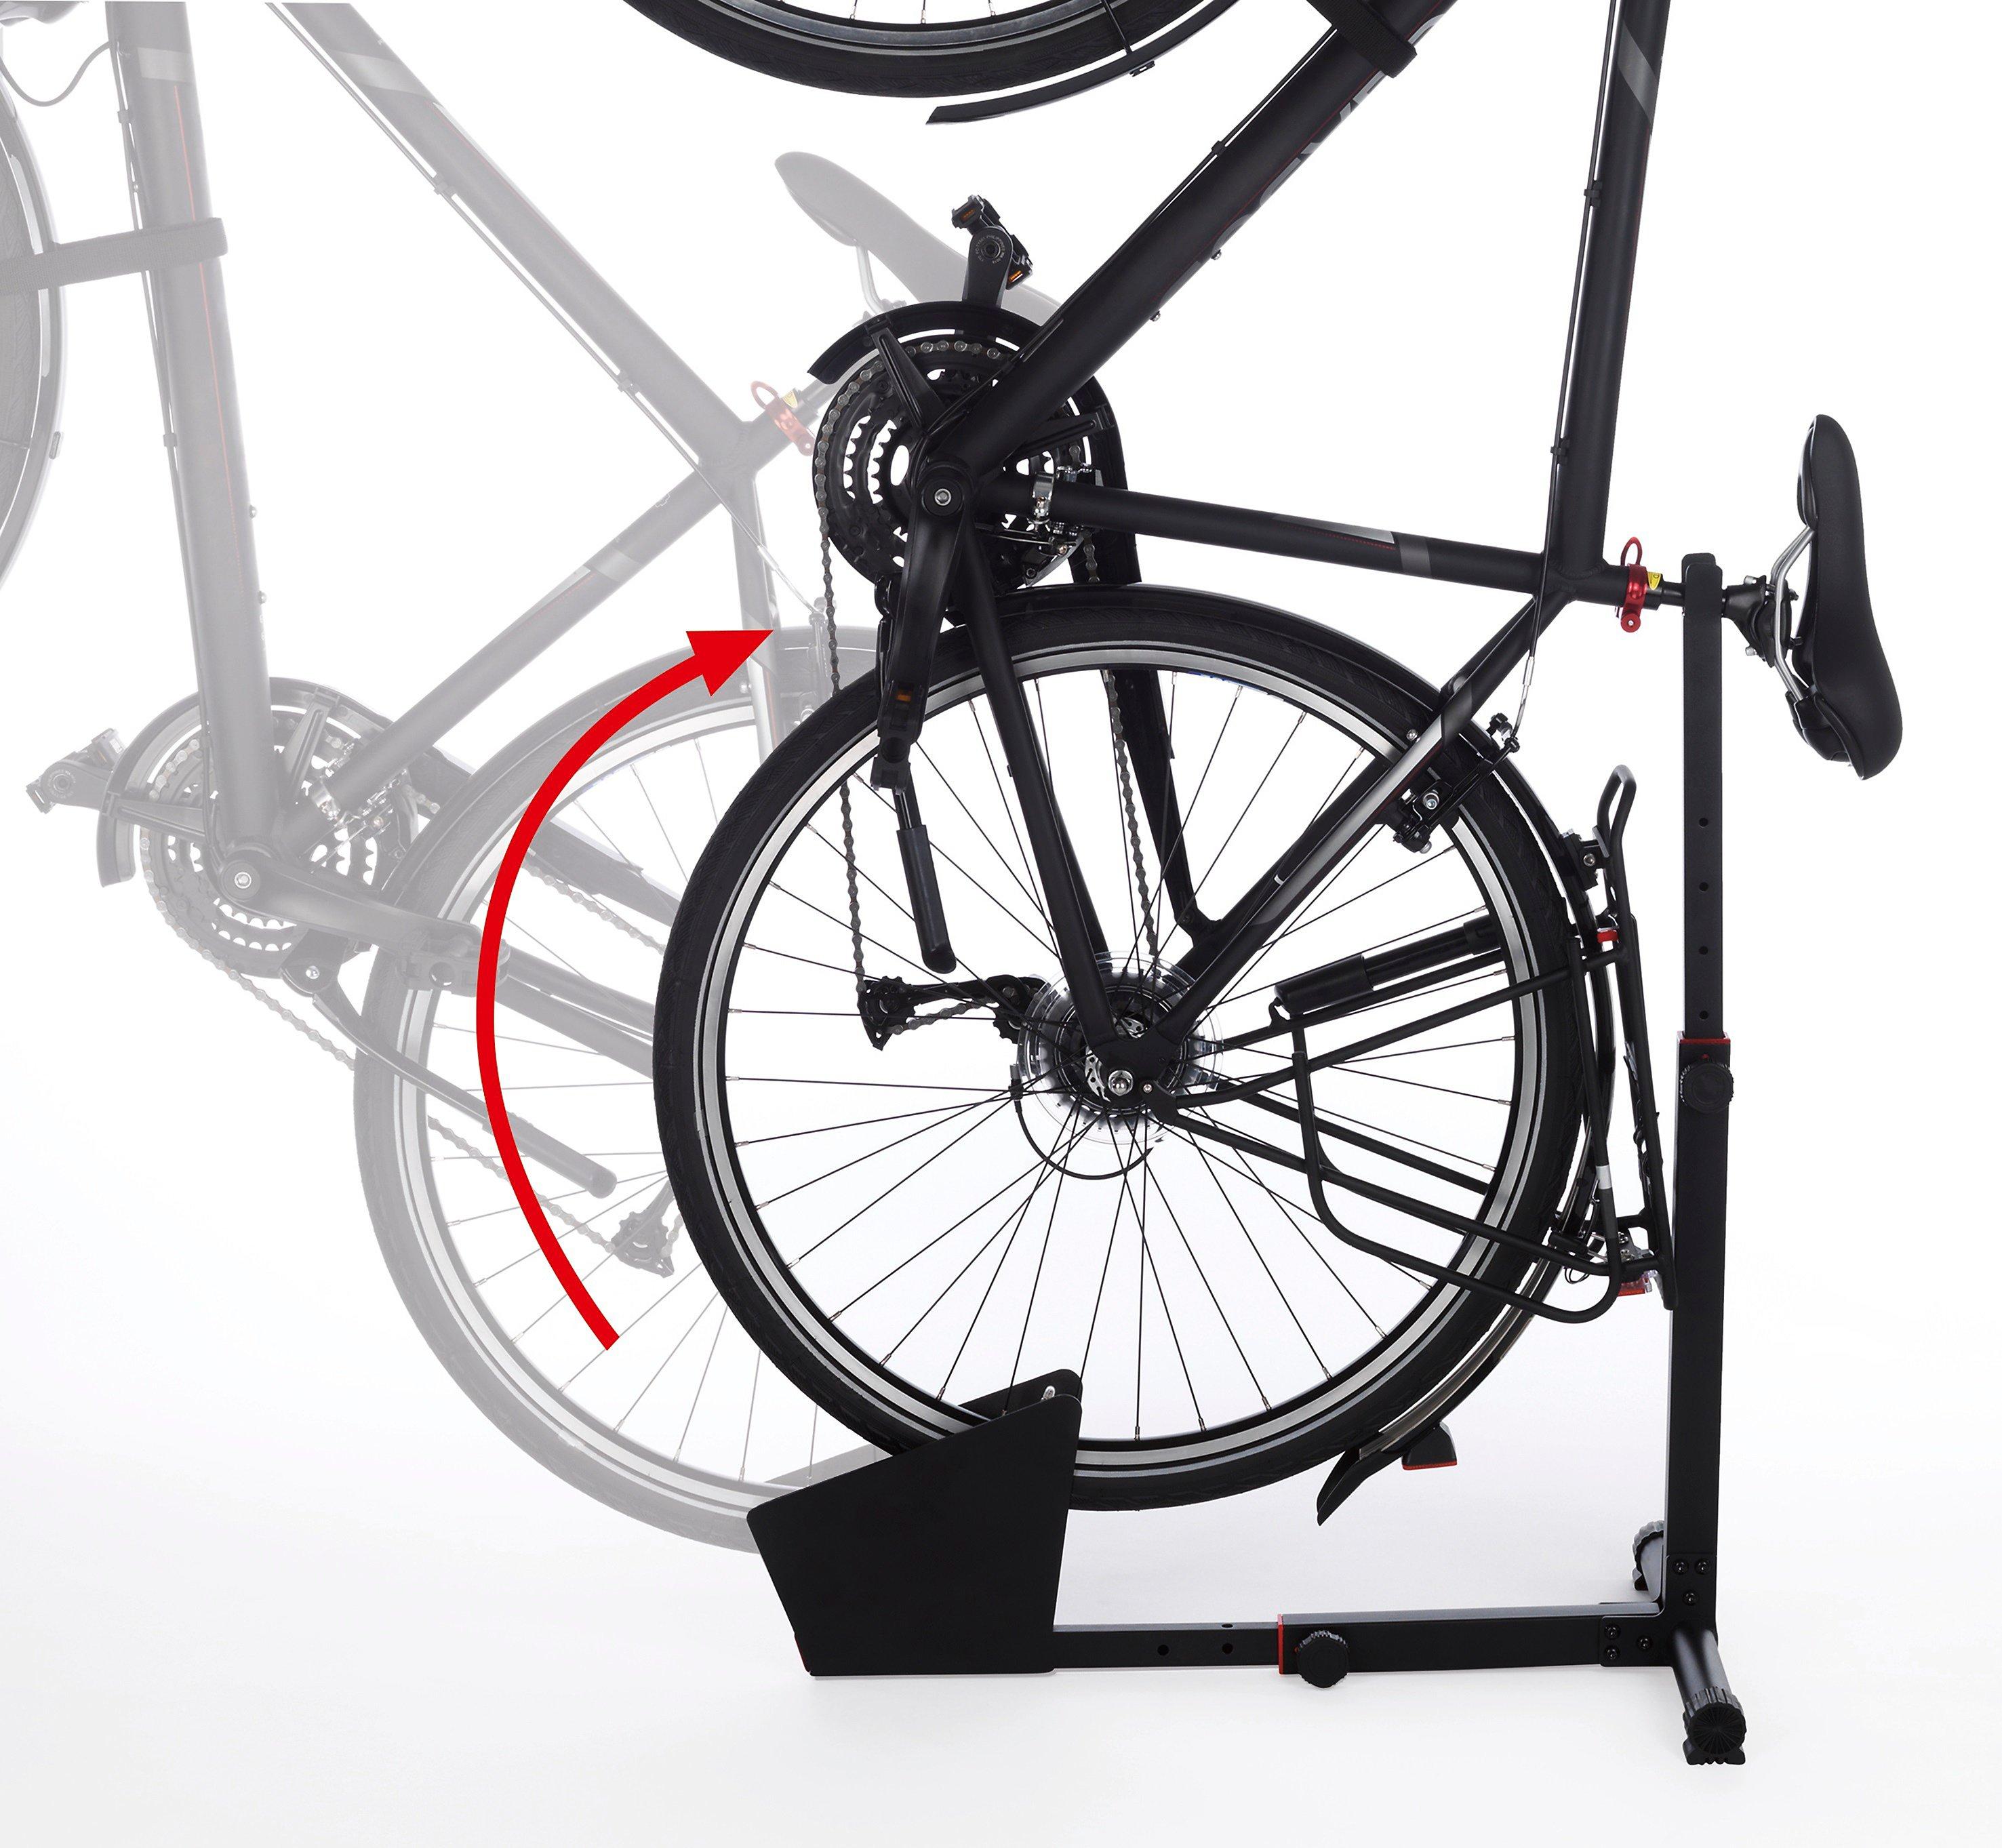 vertikaler fahrradständer jetzt bei weltbild.de bestellen